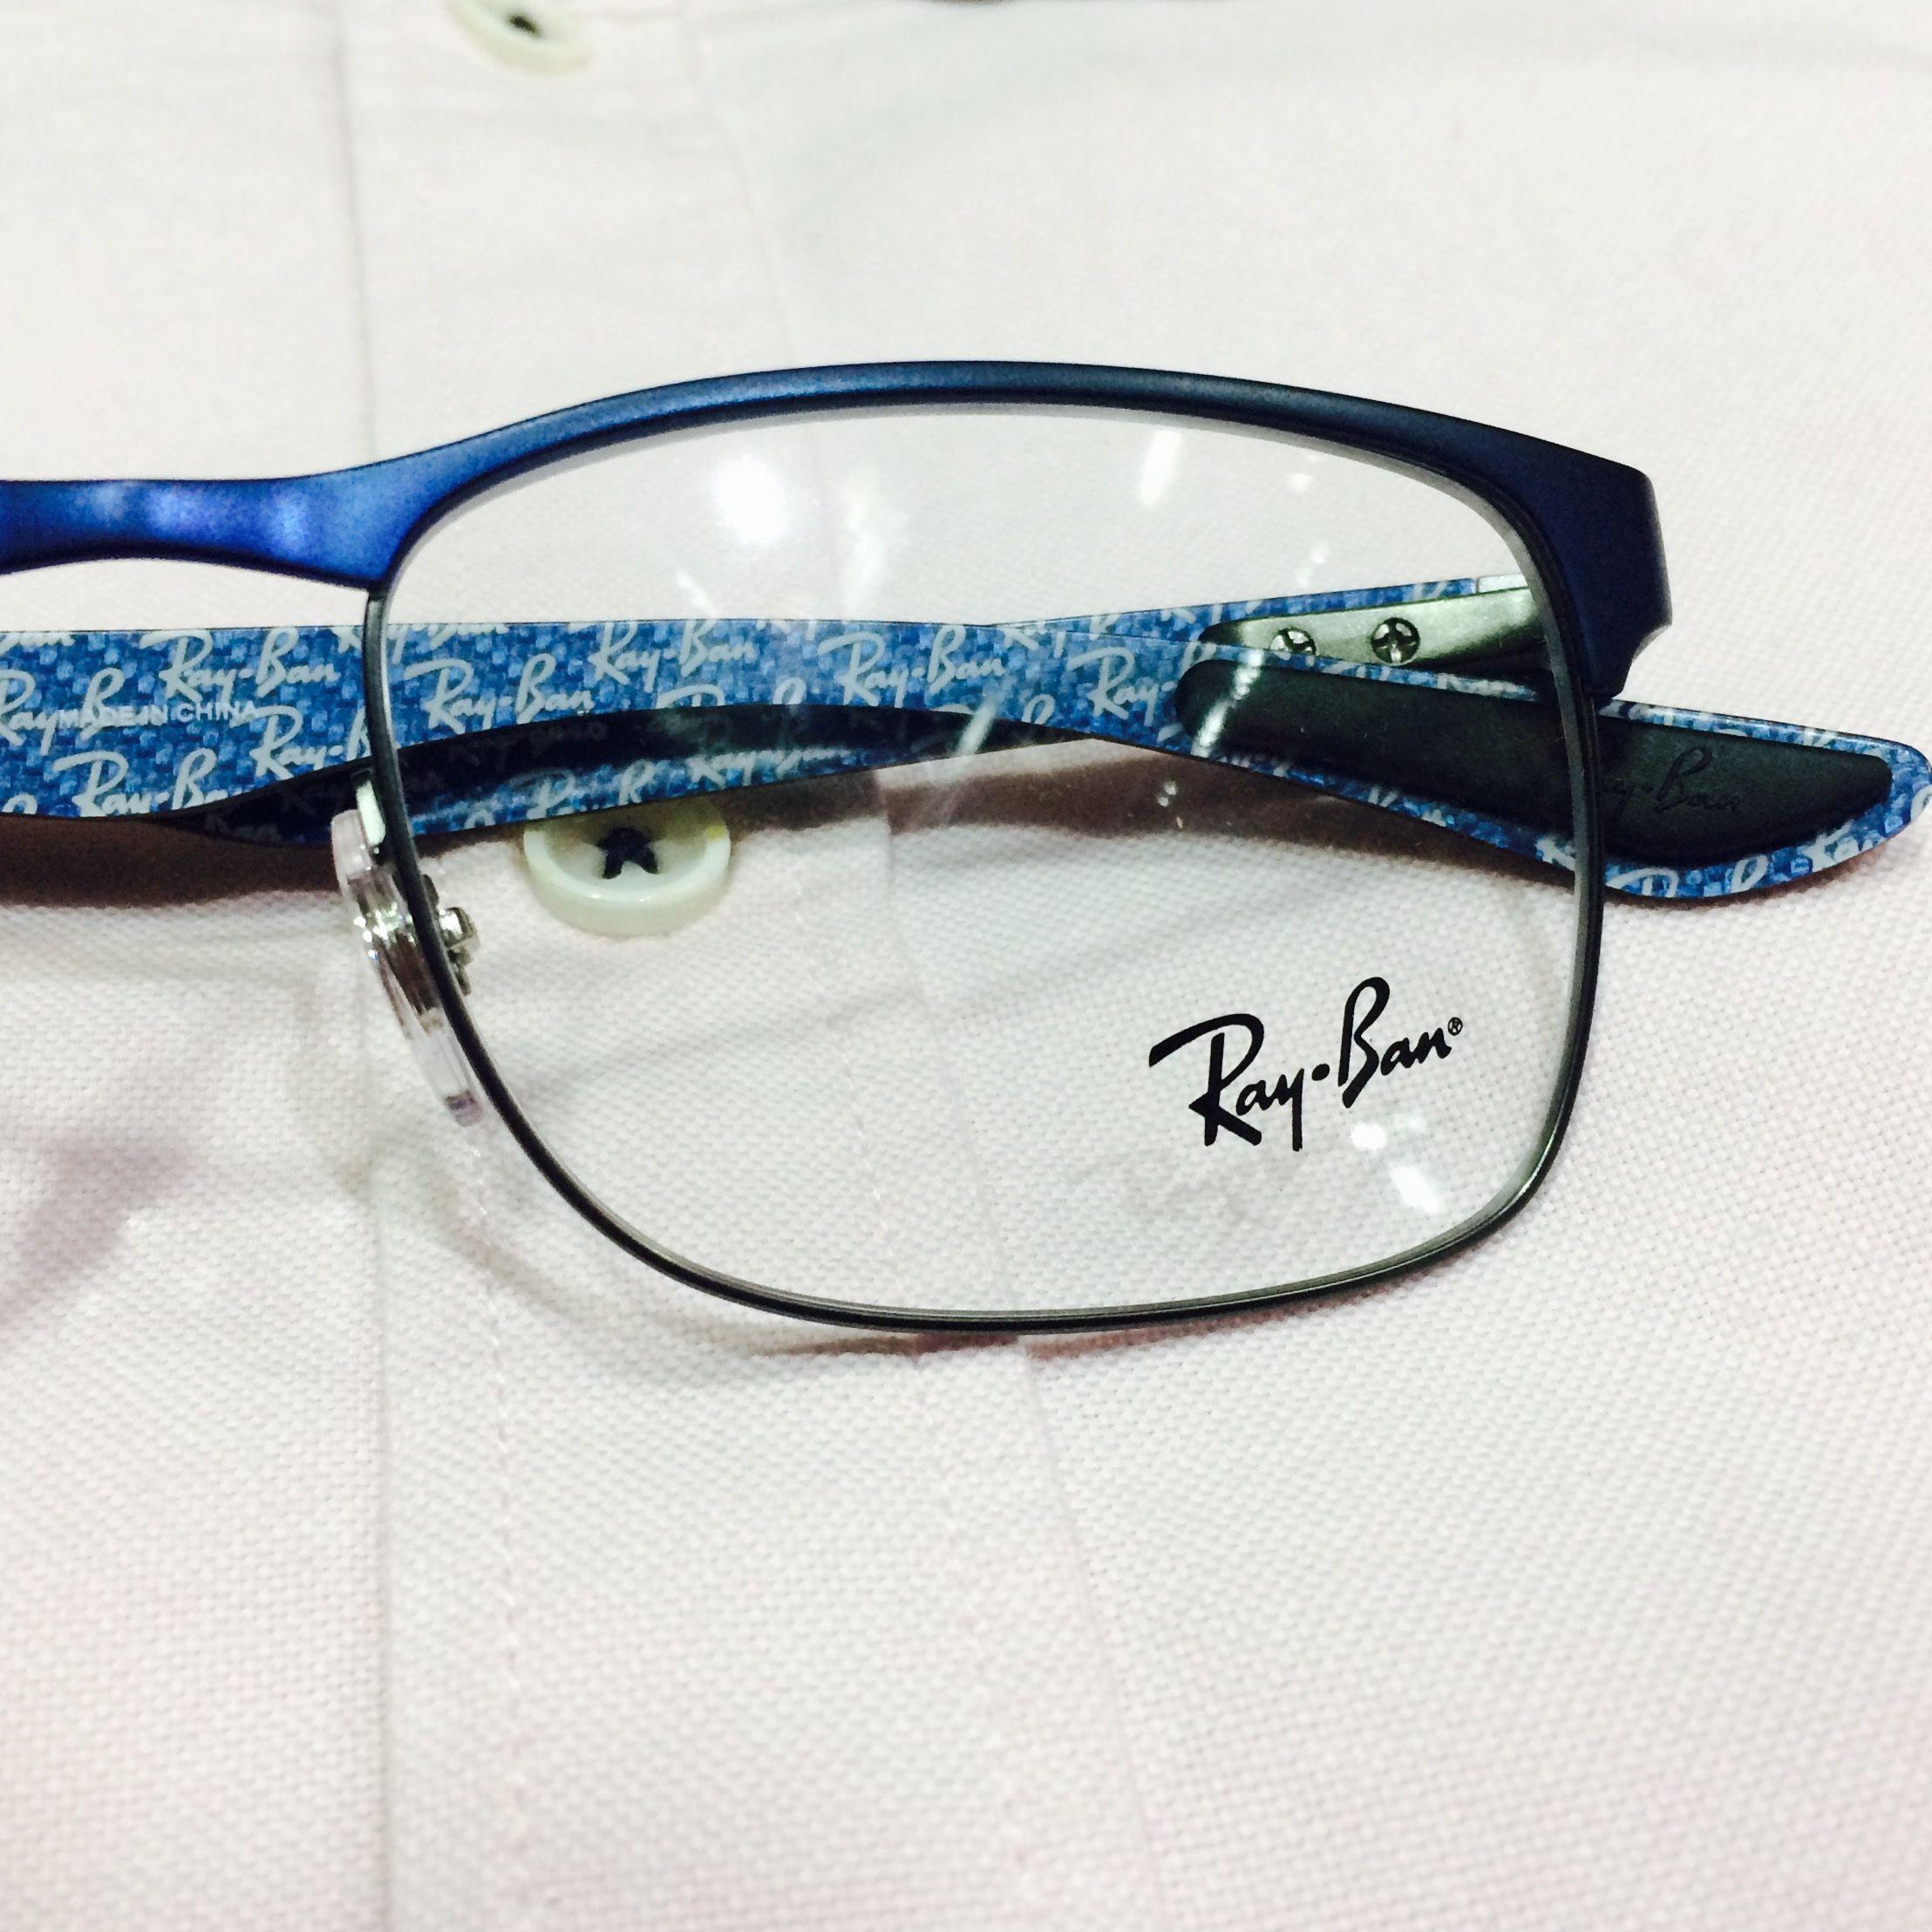 b00d20c472 Ray-Ban RB8416 2914 Gunmetal   Blue Matte Carbon Fiber 53O17 145mm   carbonfibre  eyewear  raybaneyeglasses  raybanglasses  authentic   rarezaoriginal  rareza ...